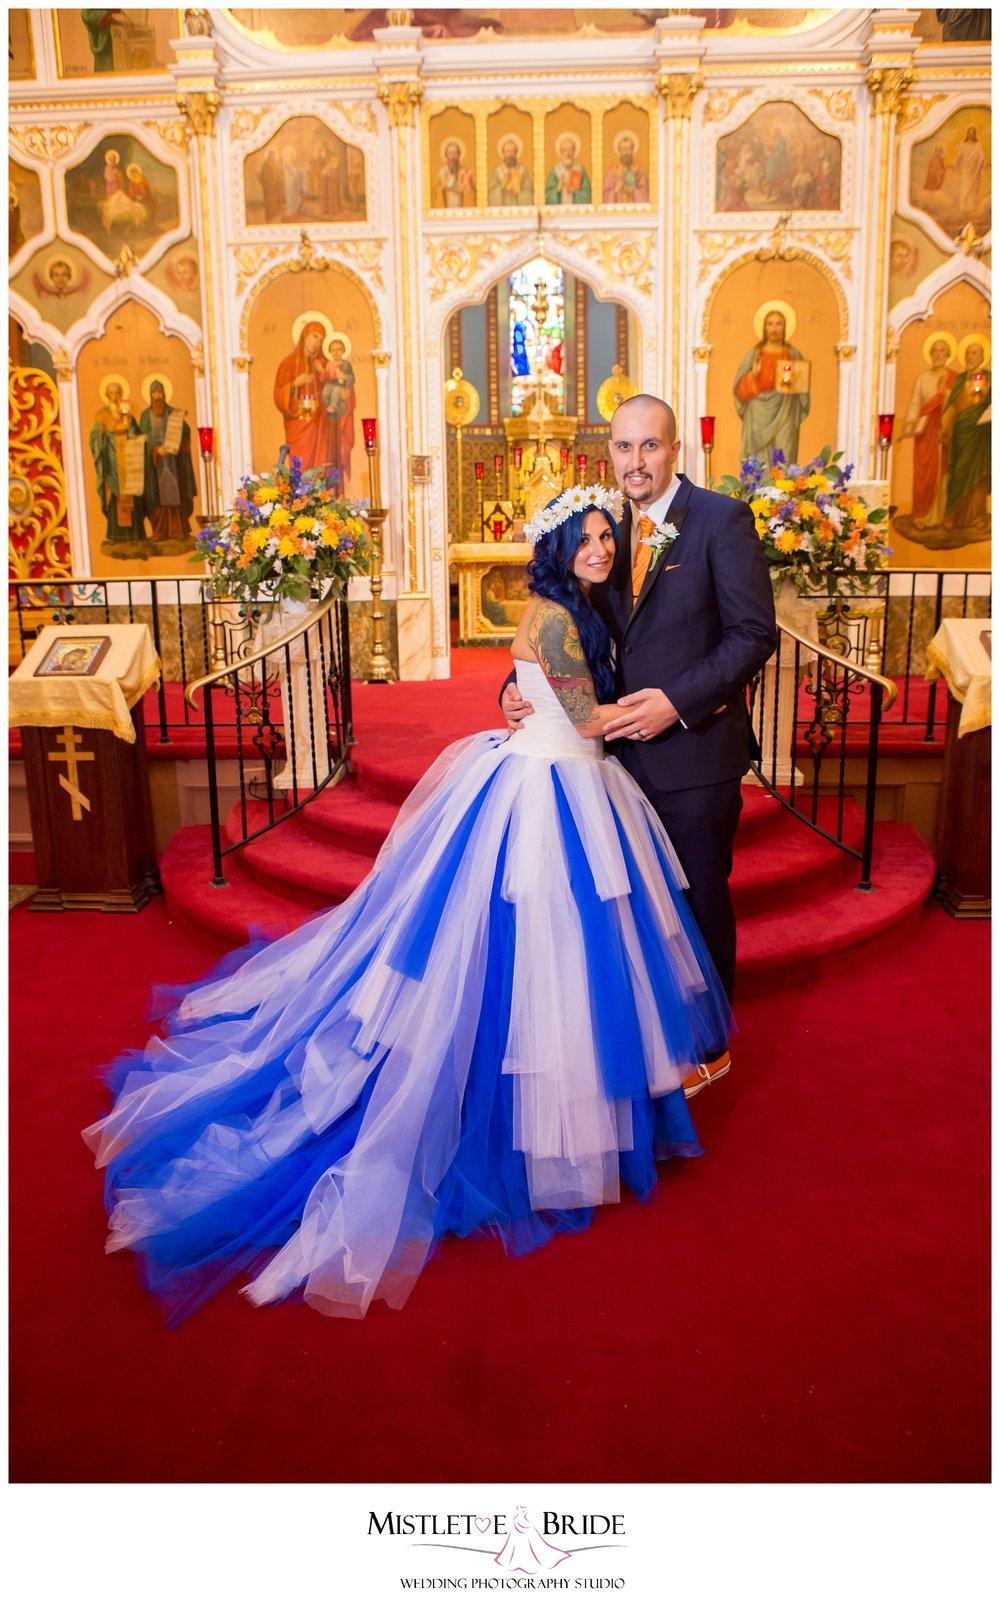 terrace-biagios-wedding-nj-mistletoe-bride-1101.JPG